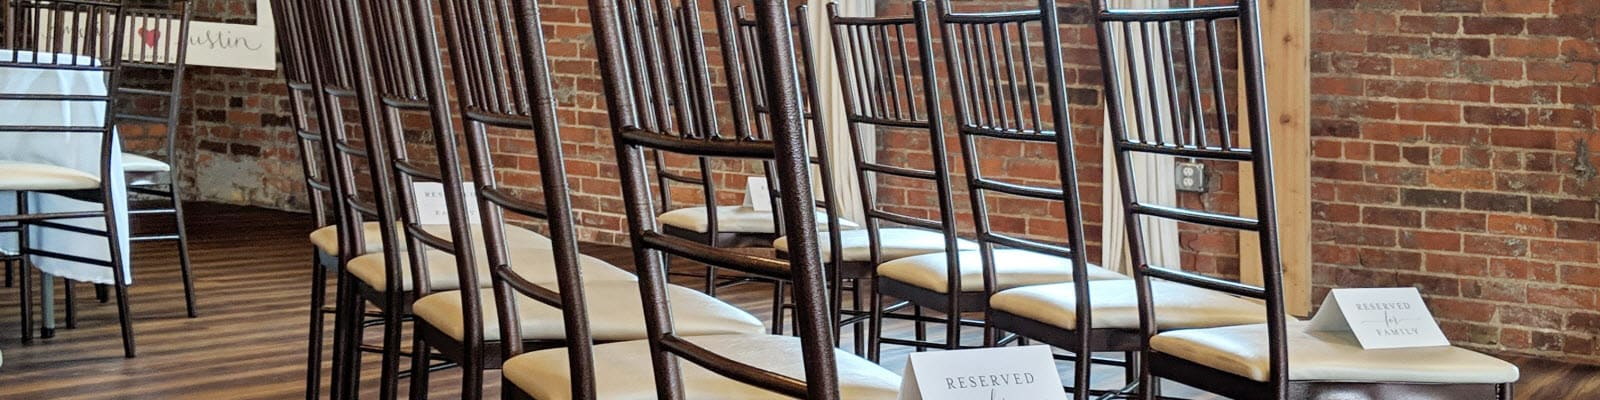 Metal chiavari chairs